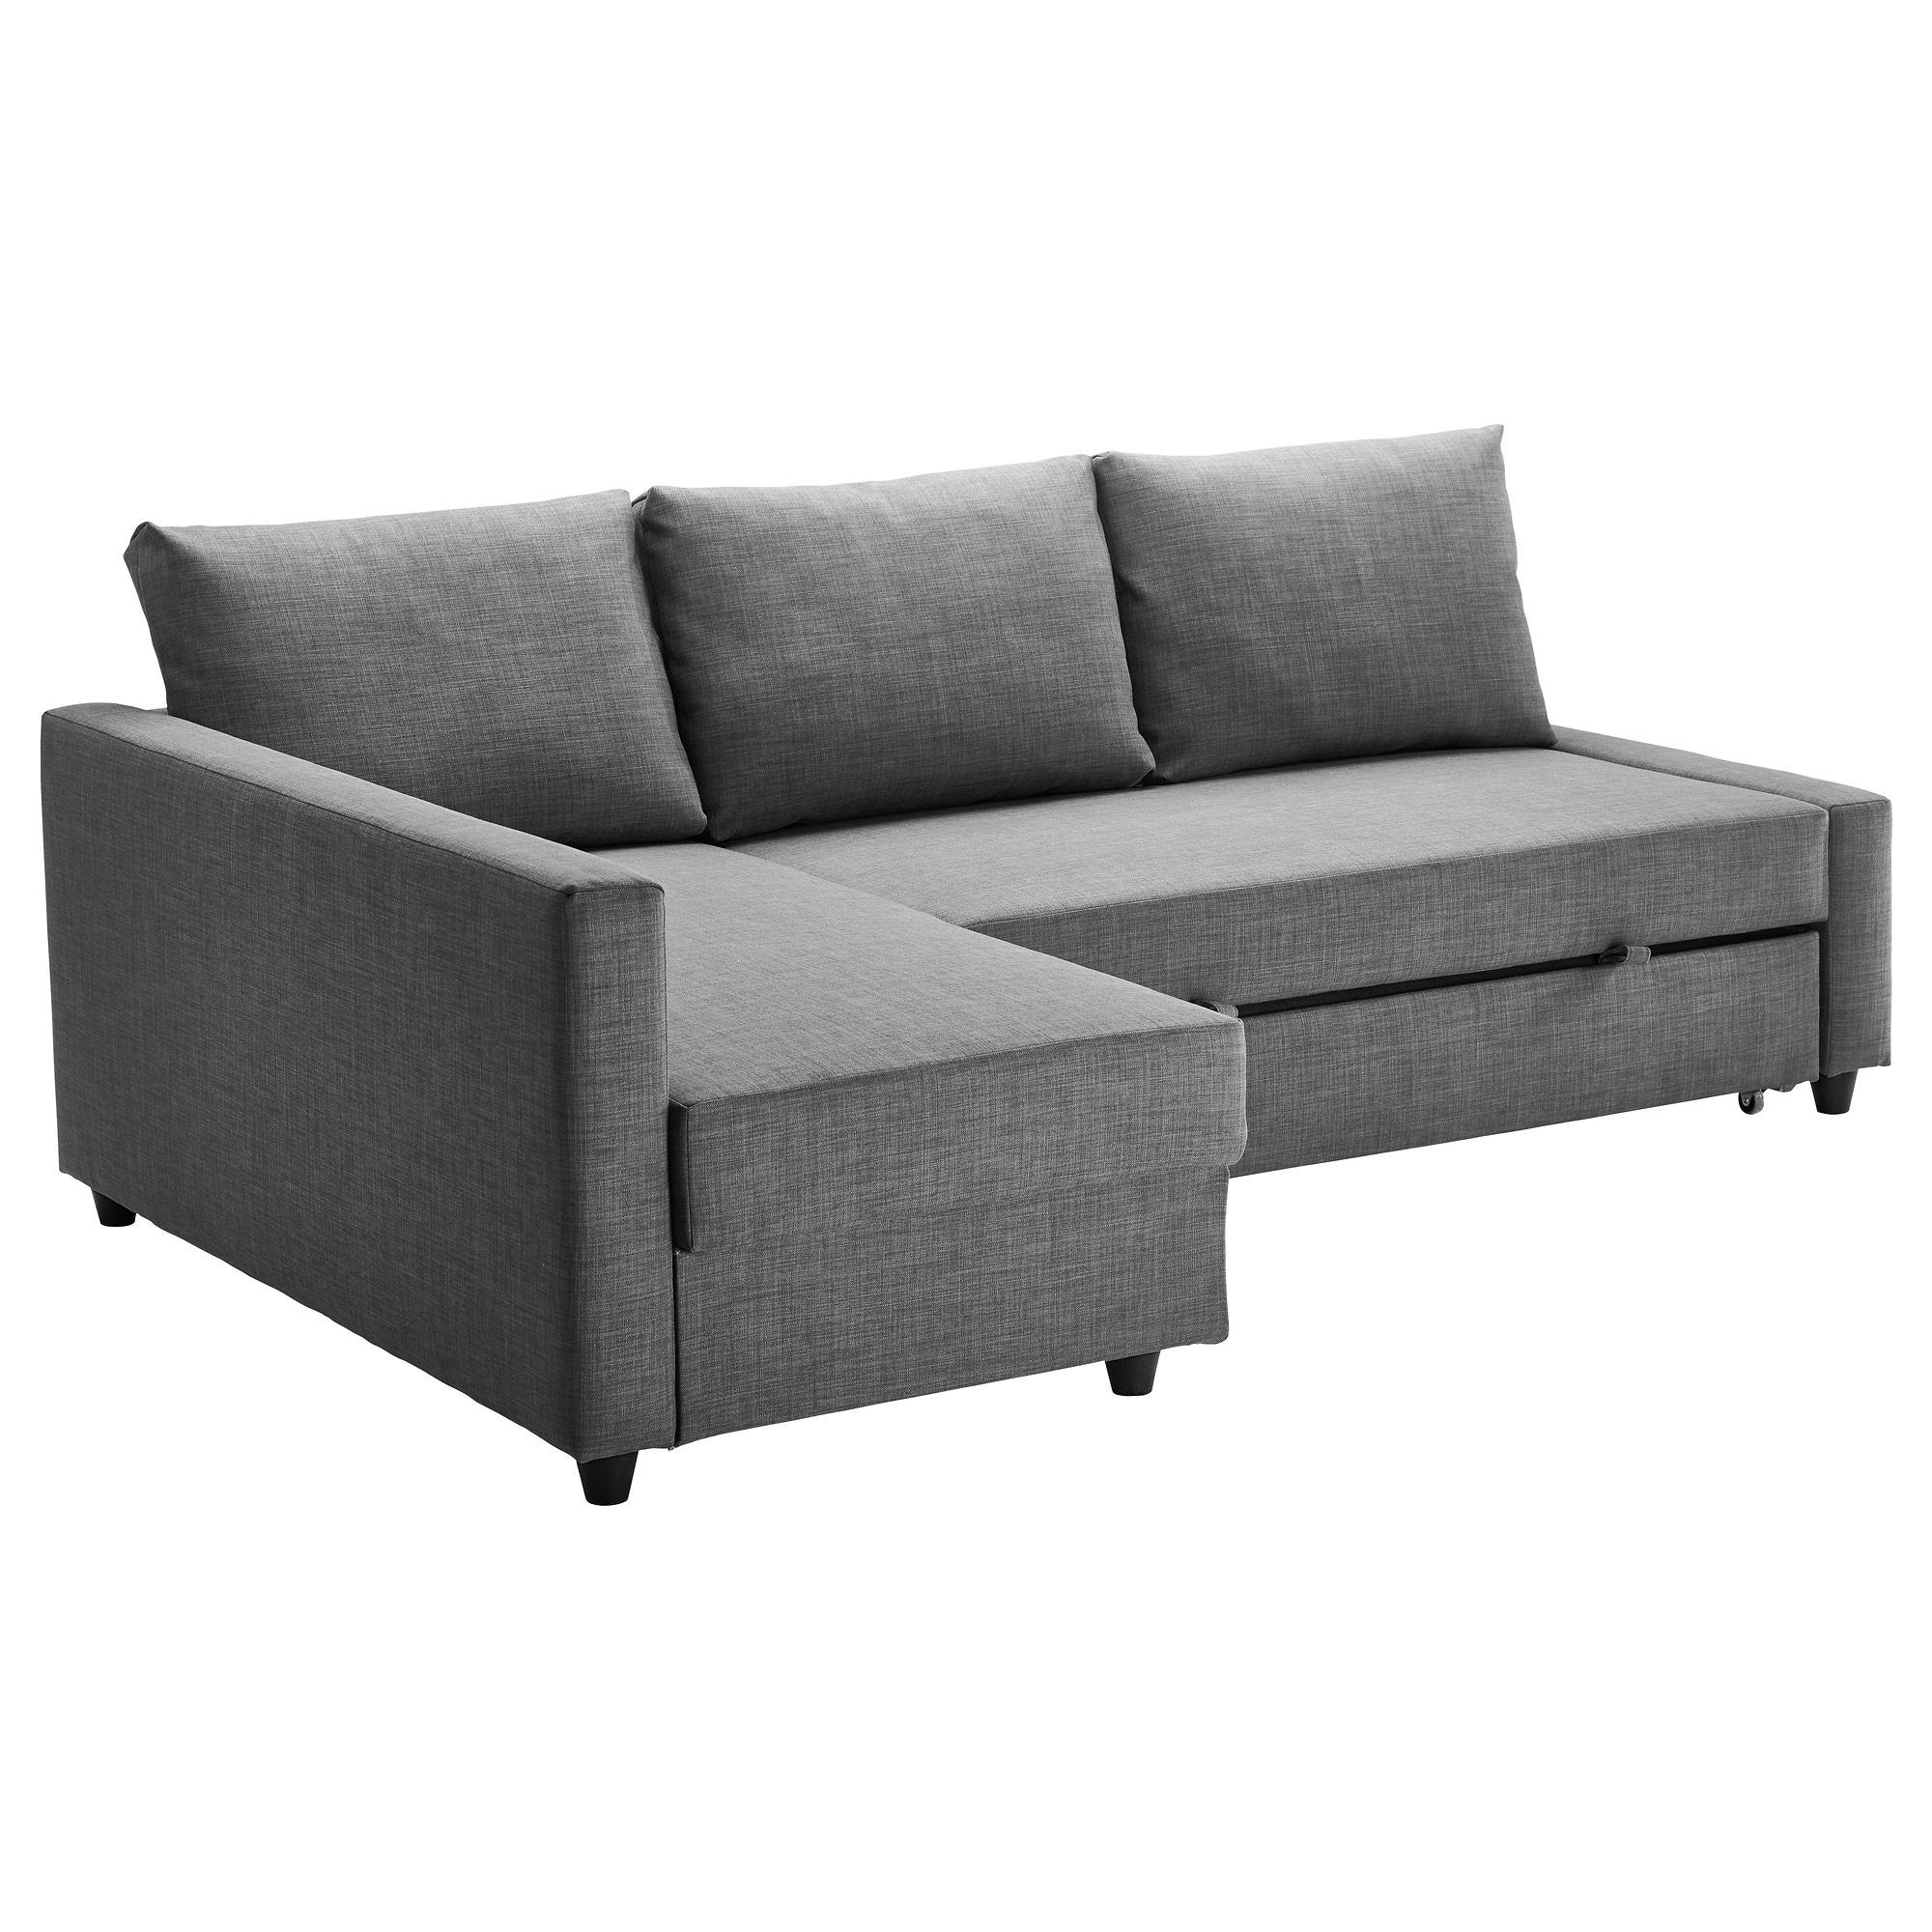 Ikea sofas Cama J7do Friheten sofà Cama Esquina Con Almacenaje Skiftebo Gris Oscuro Ikea